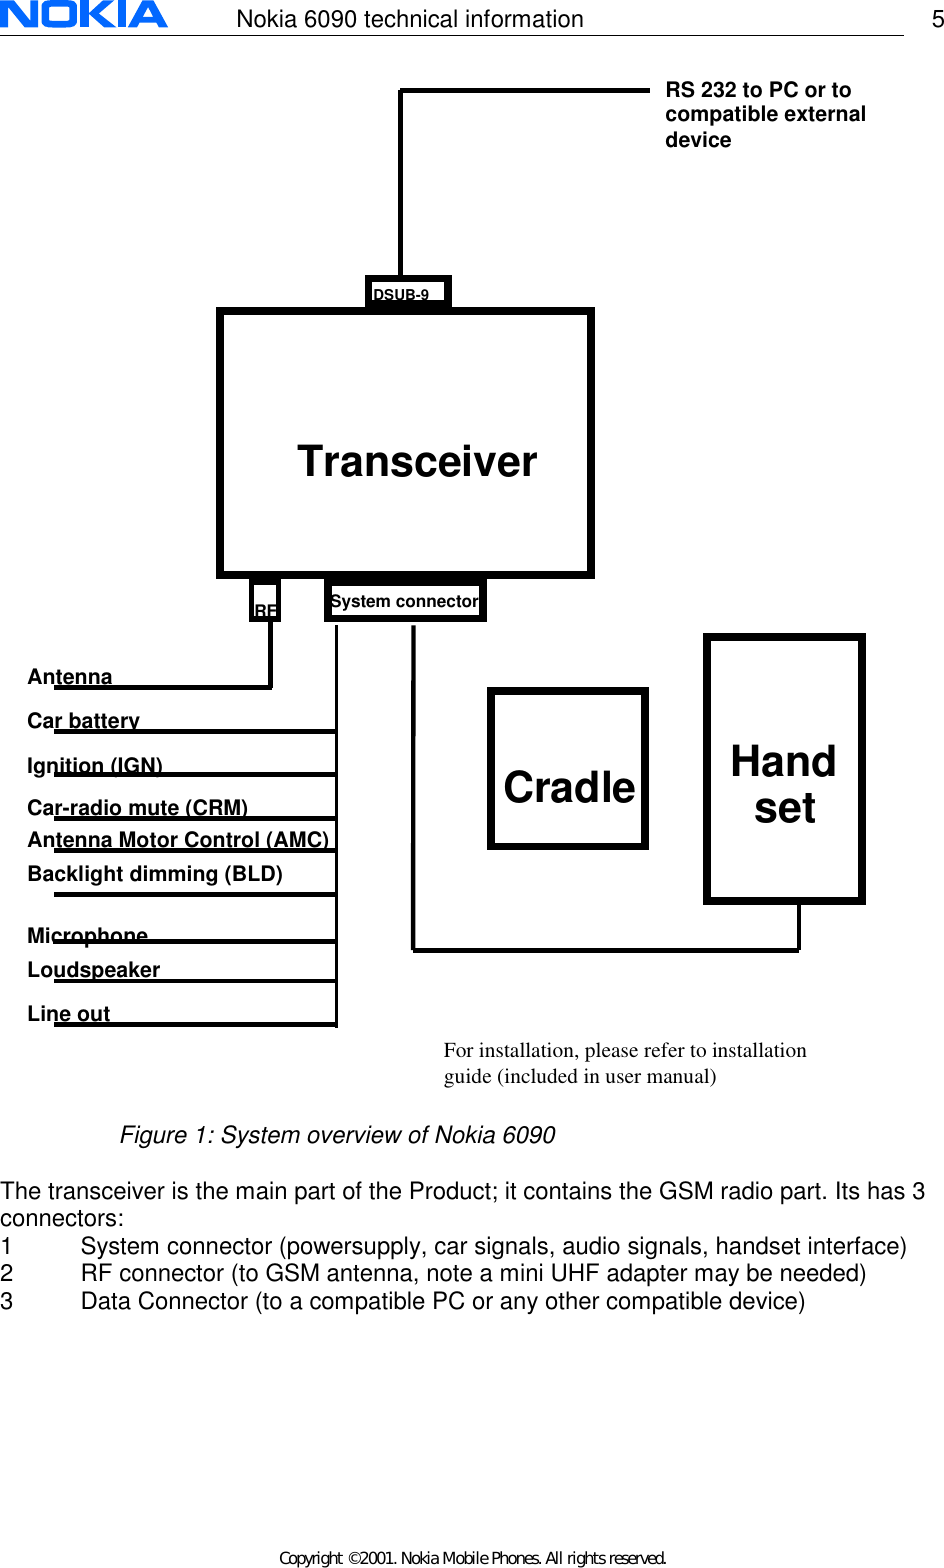 Sumas Sm6868 Wiring Diagram And Schematics Pb4 Booster Pump Motor Diagrams Source Ikelite 6090 Nokia Hardware Information User Manual To The 9e72c8da